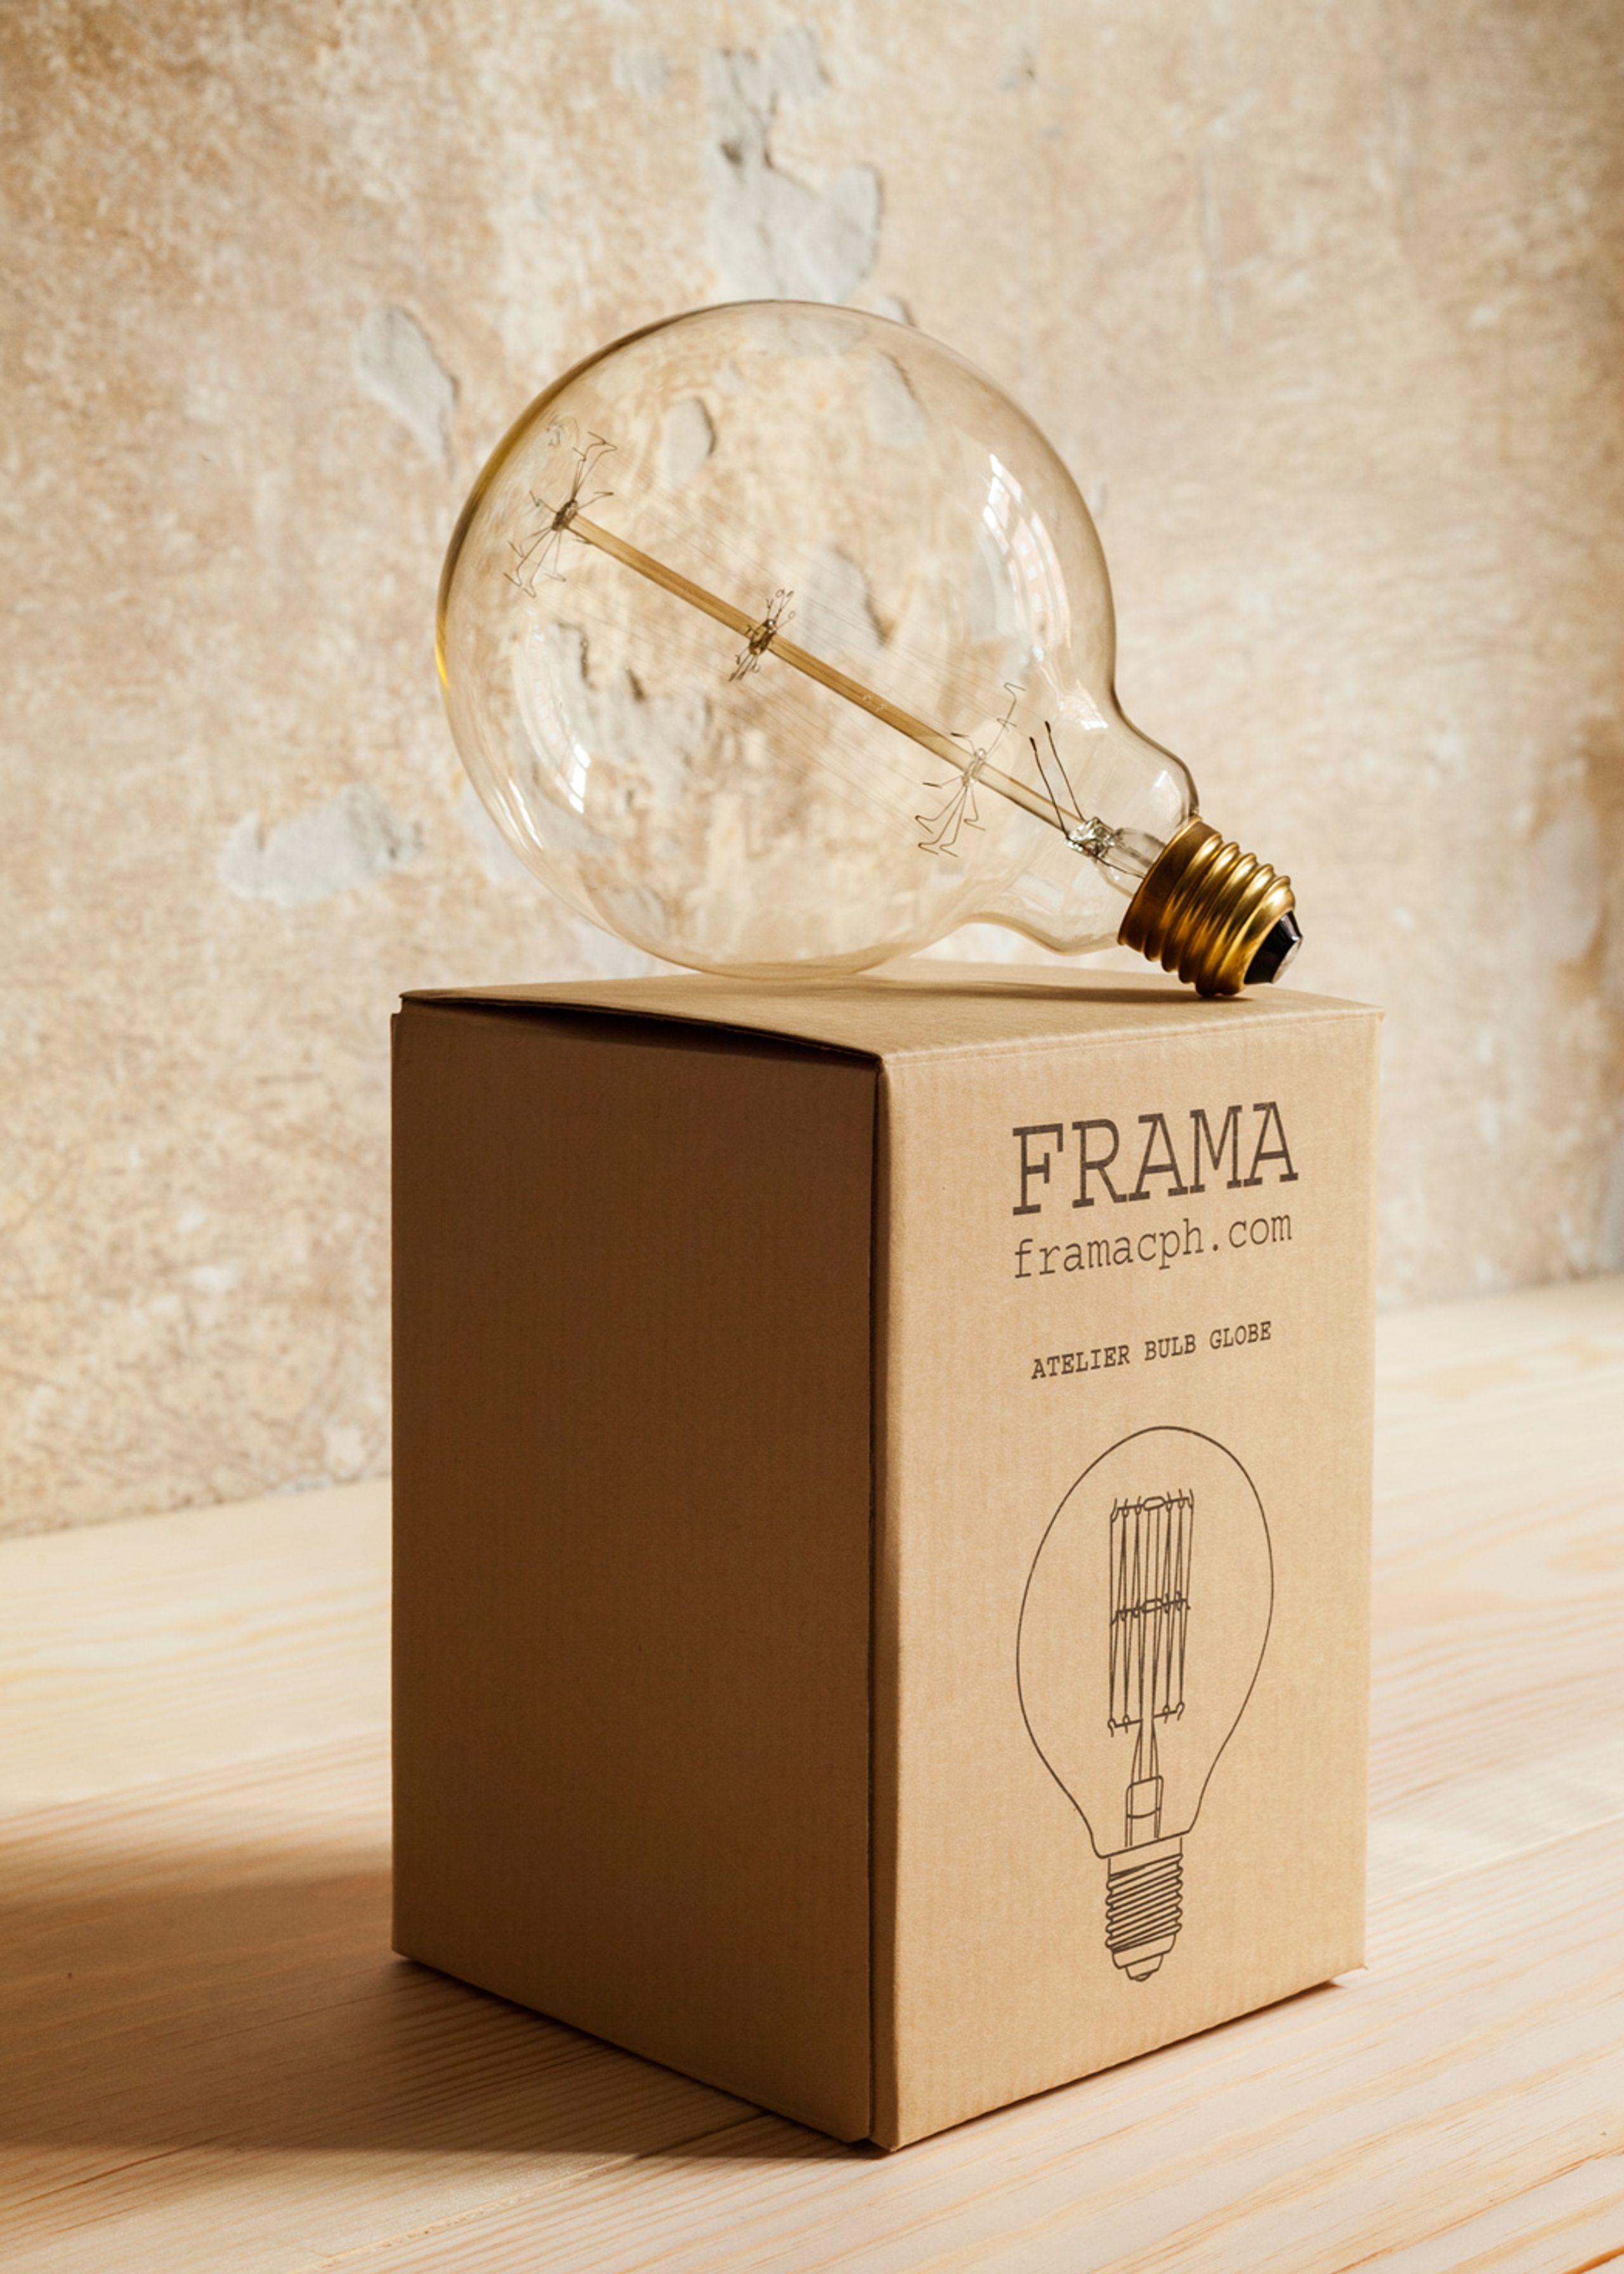 Atelier bulb globe